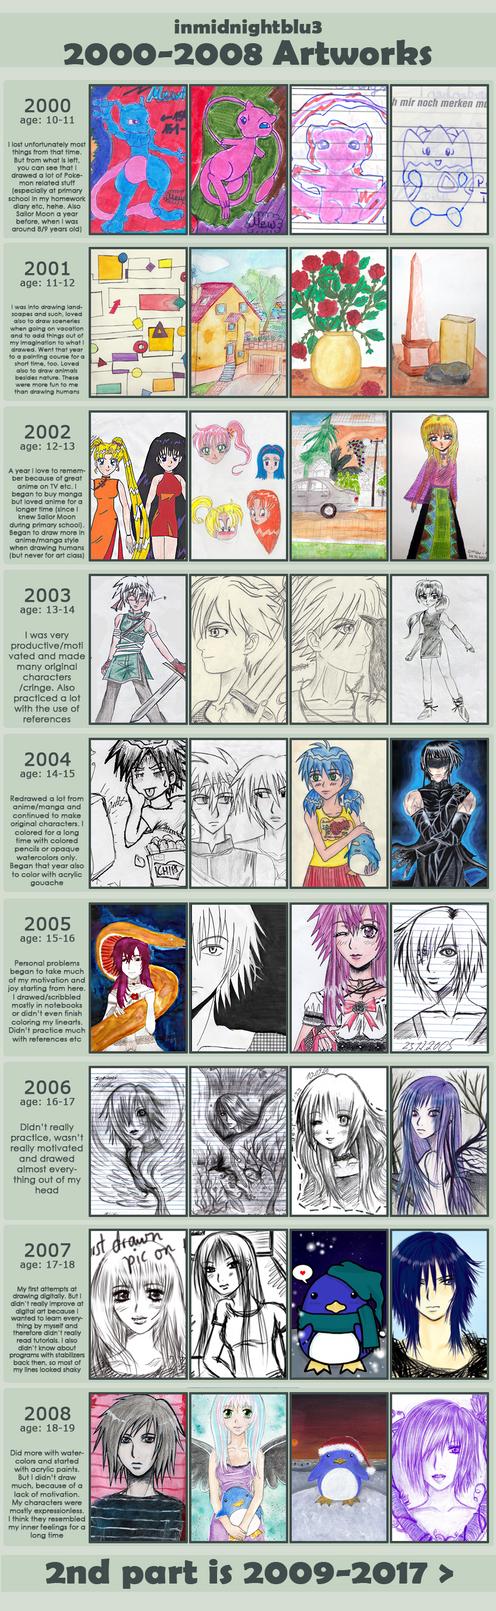 Improvement meme (2000-2008) by inmidnightblu3